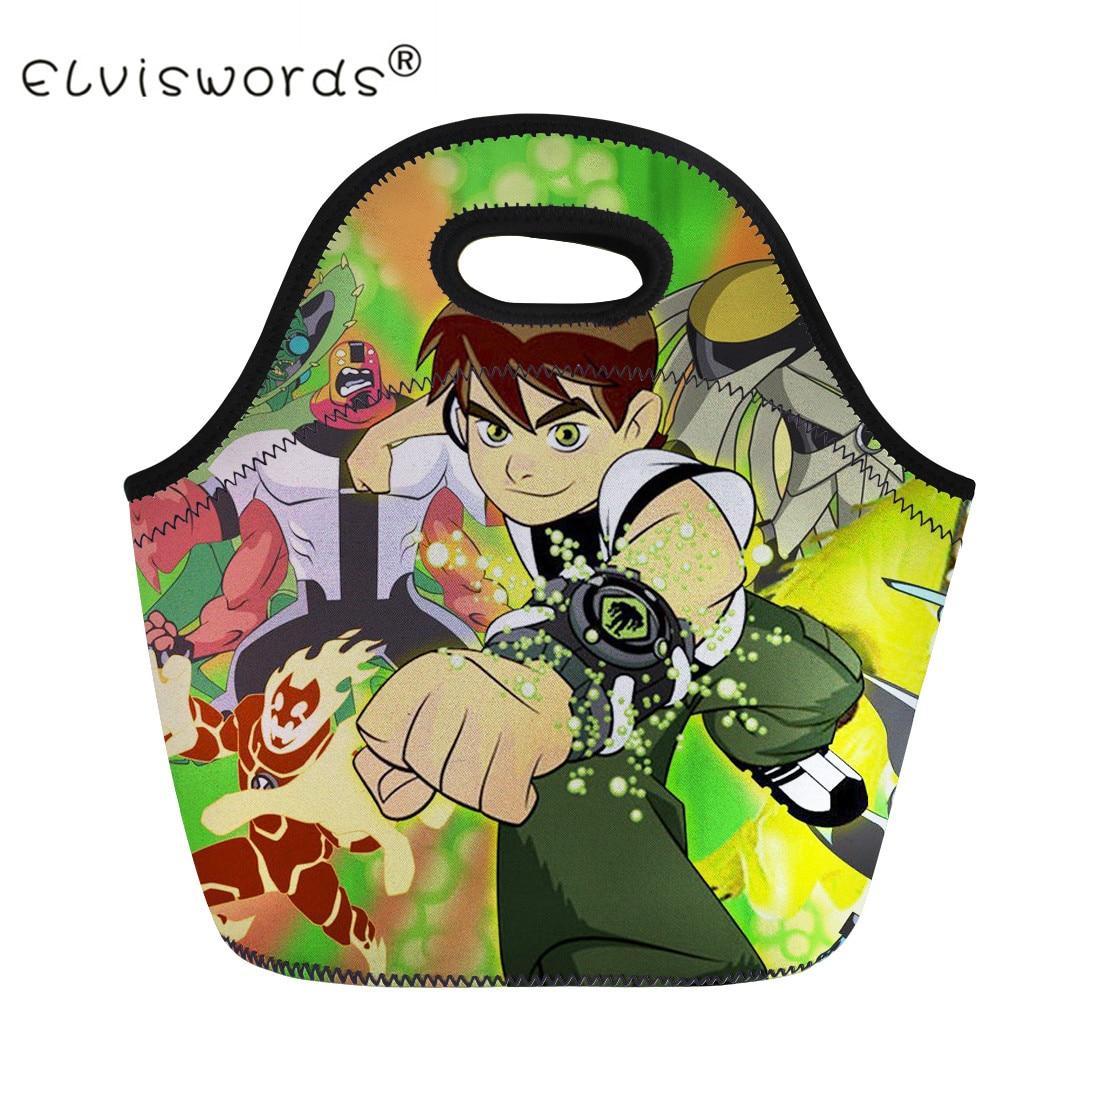 ELVISWORDS Lunch Bag for Boys Cartoon Ben 10 Printing Carry Lunch Box for Kids Insulated Picnic Food Bag Bolsa Termica Lancheira